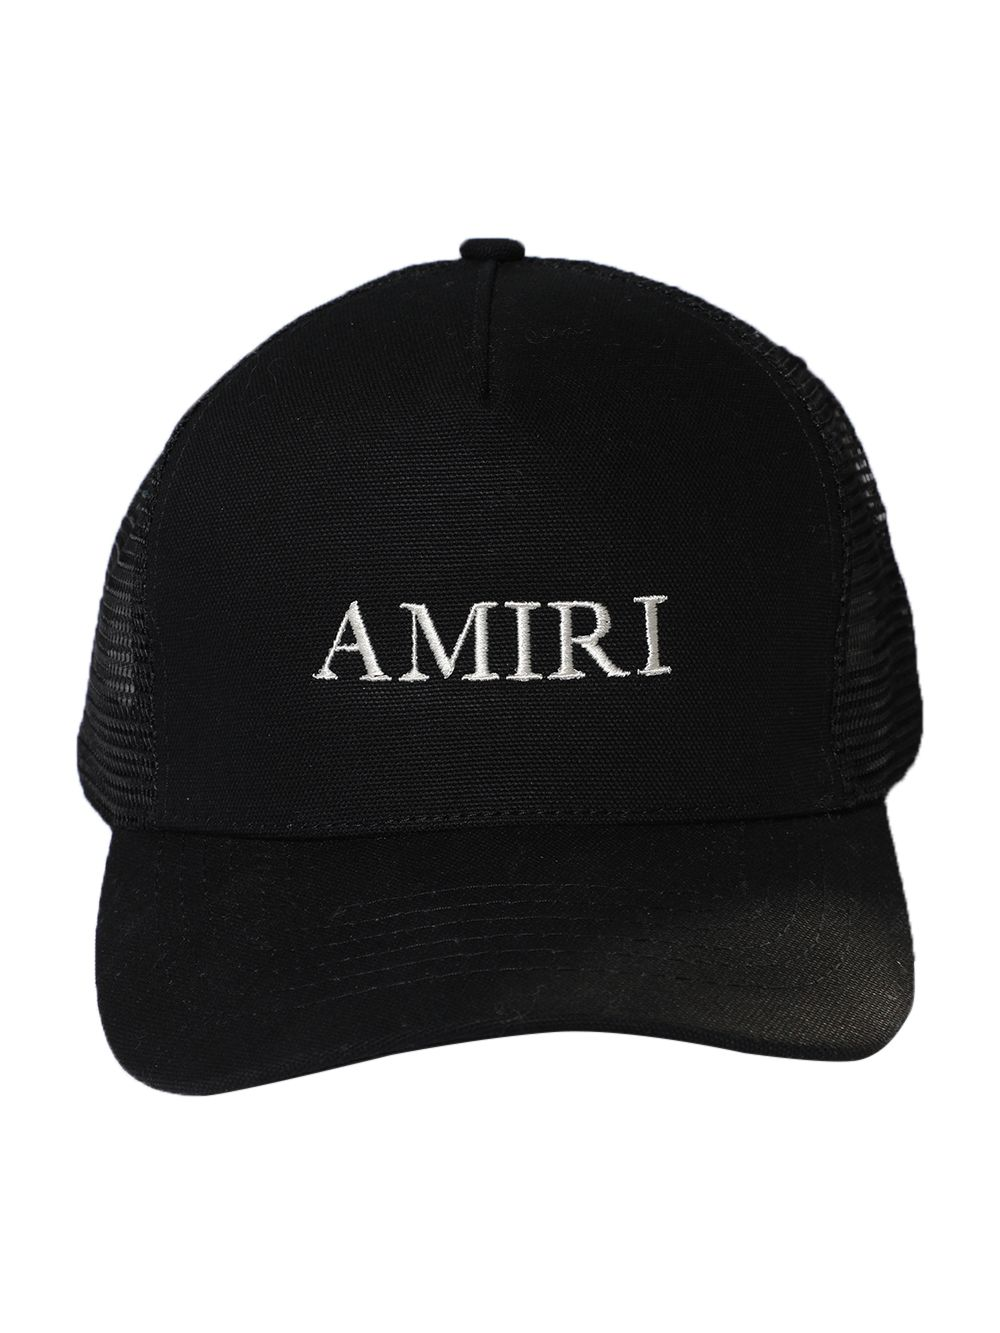 AMIRI BLACK AMIRI LOGO TRUCKER HAT